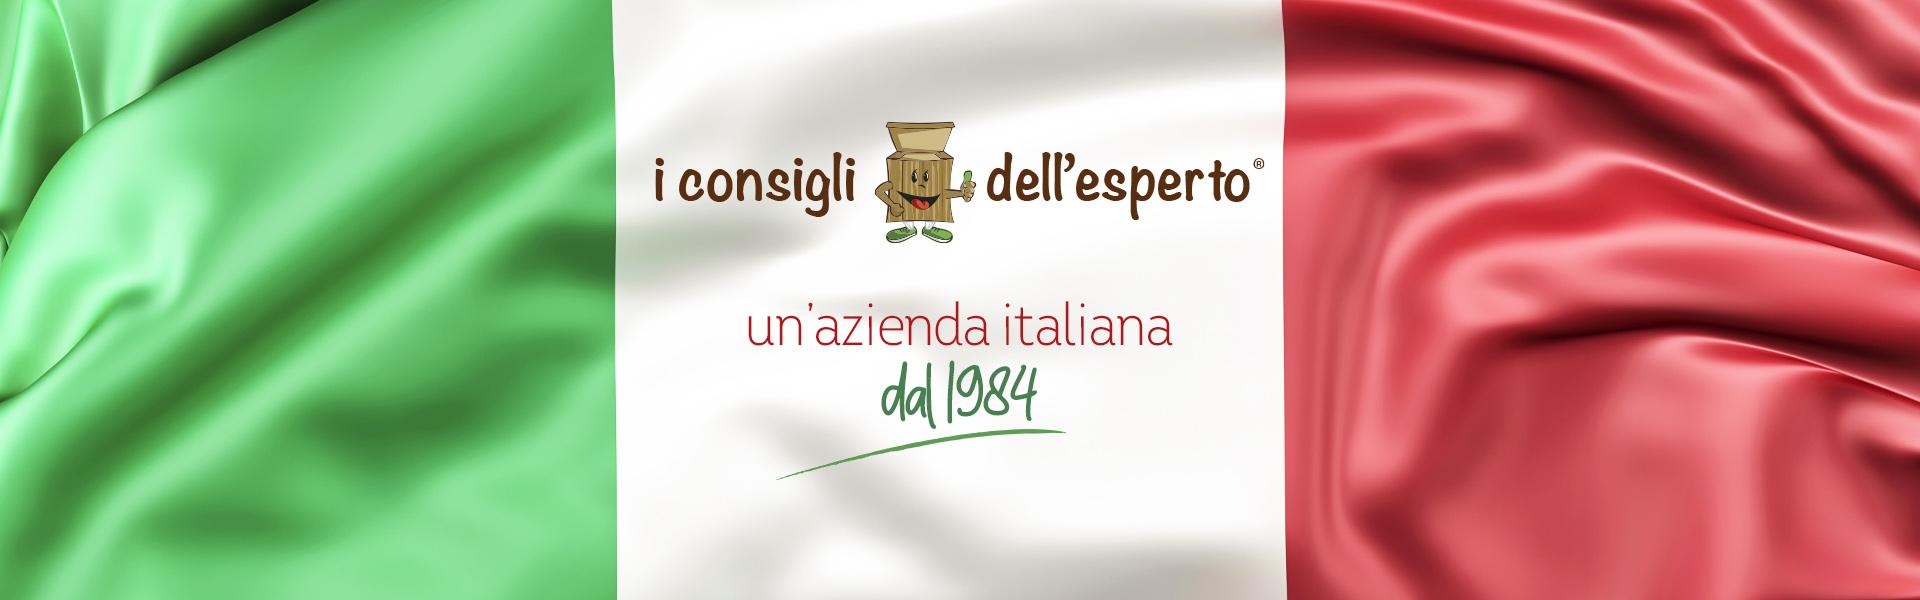 Slide_AZIENDA_ITALIANA_home